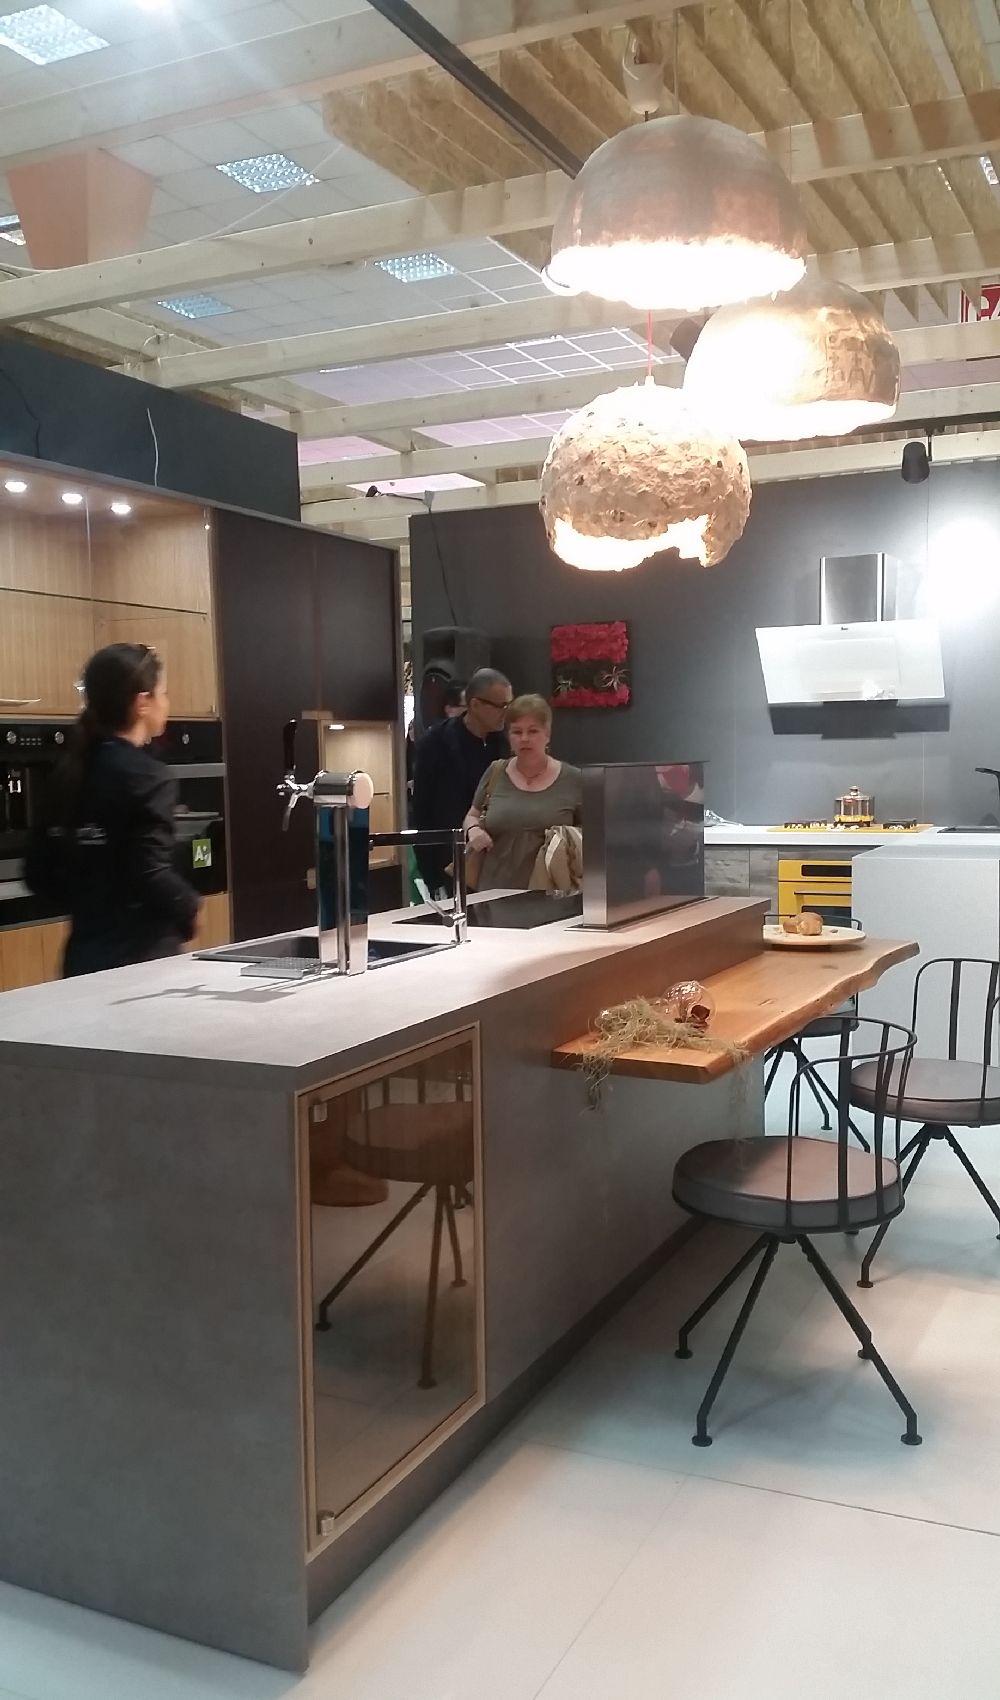 adelaparvu.com despre bucatarie cu fronturi din Tego, design Contrapunct Design, productie Euphoria Kitchens (1)